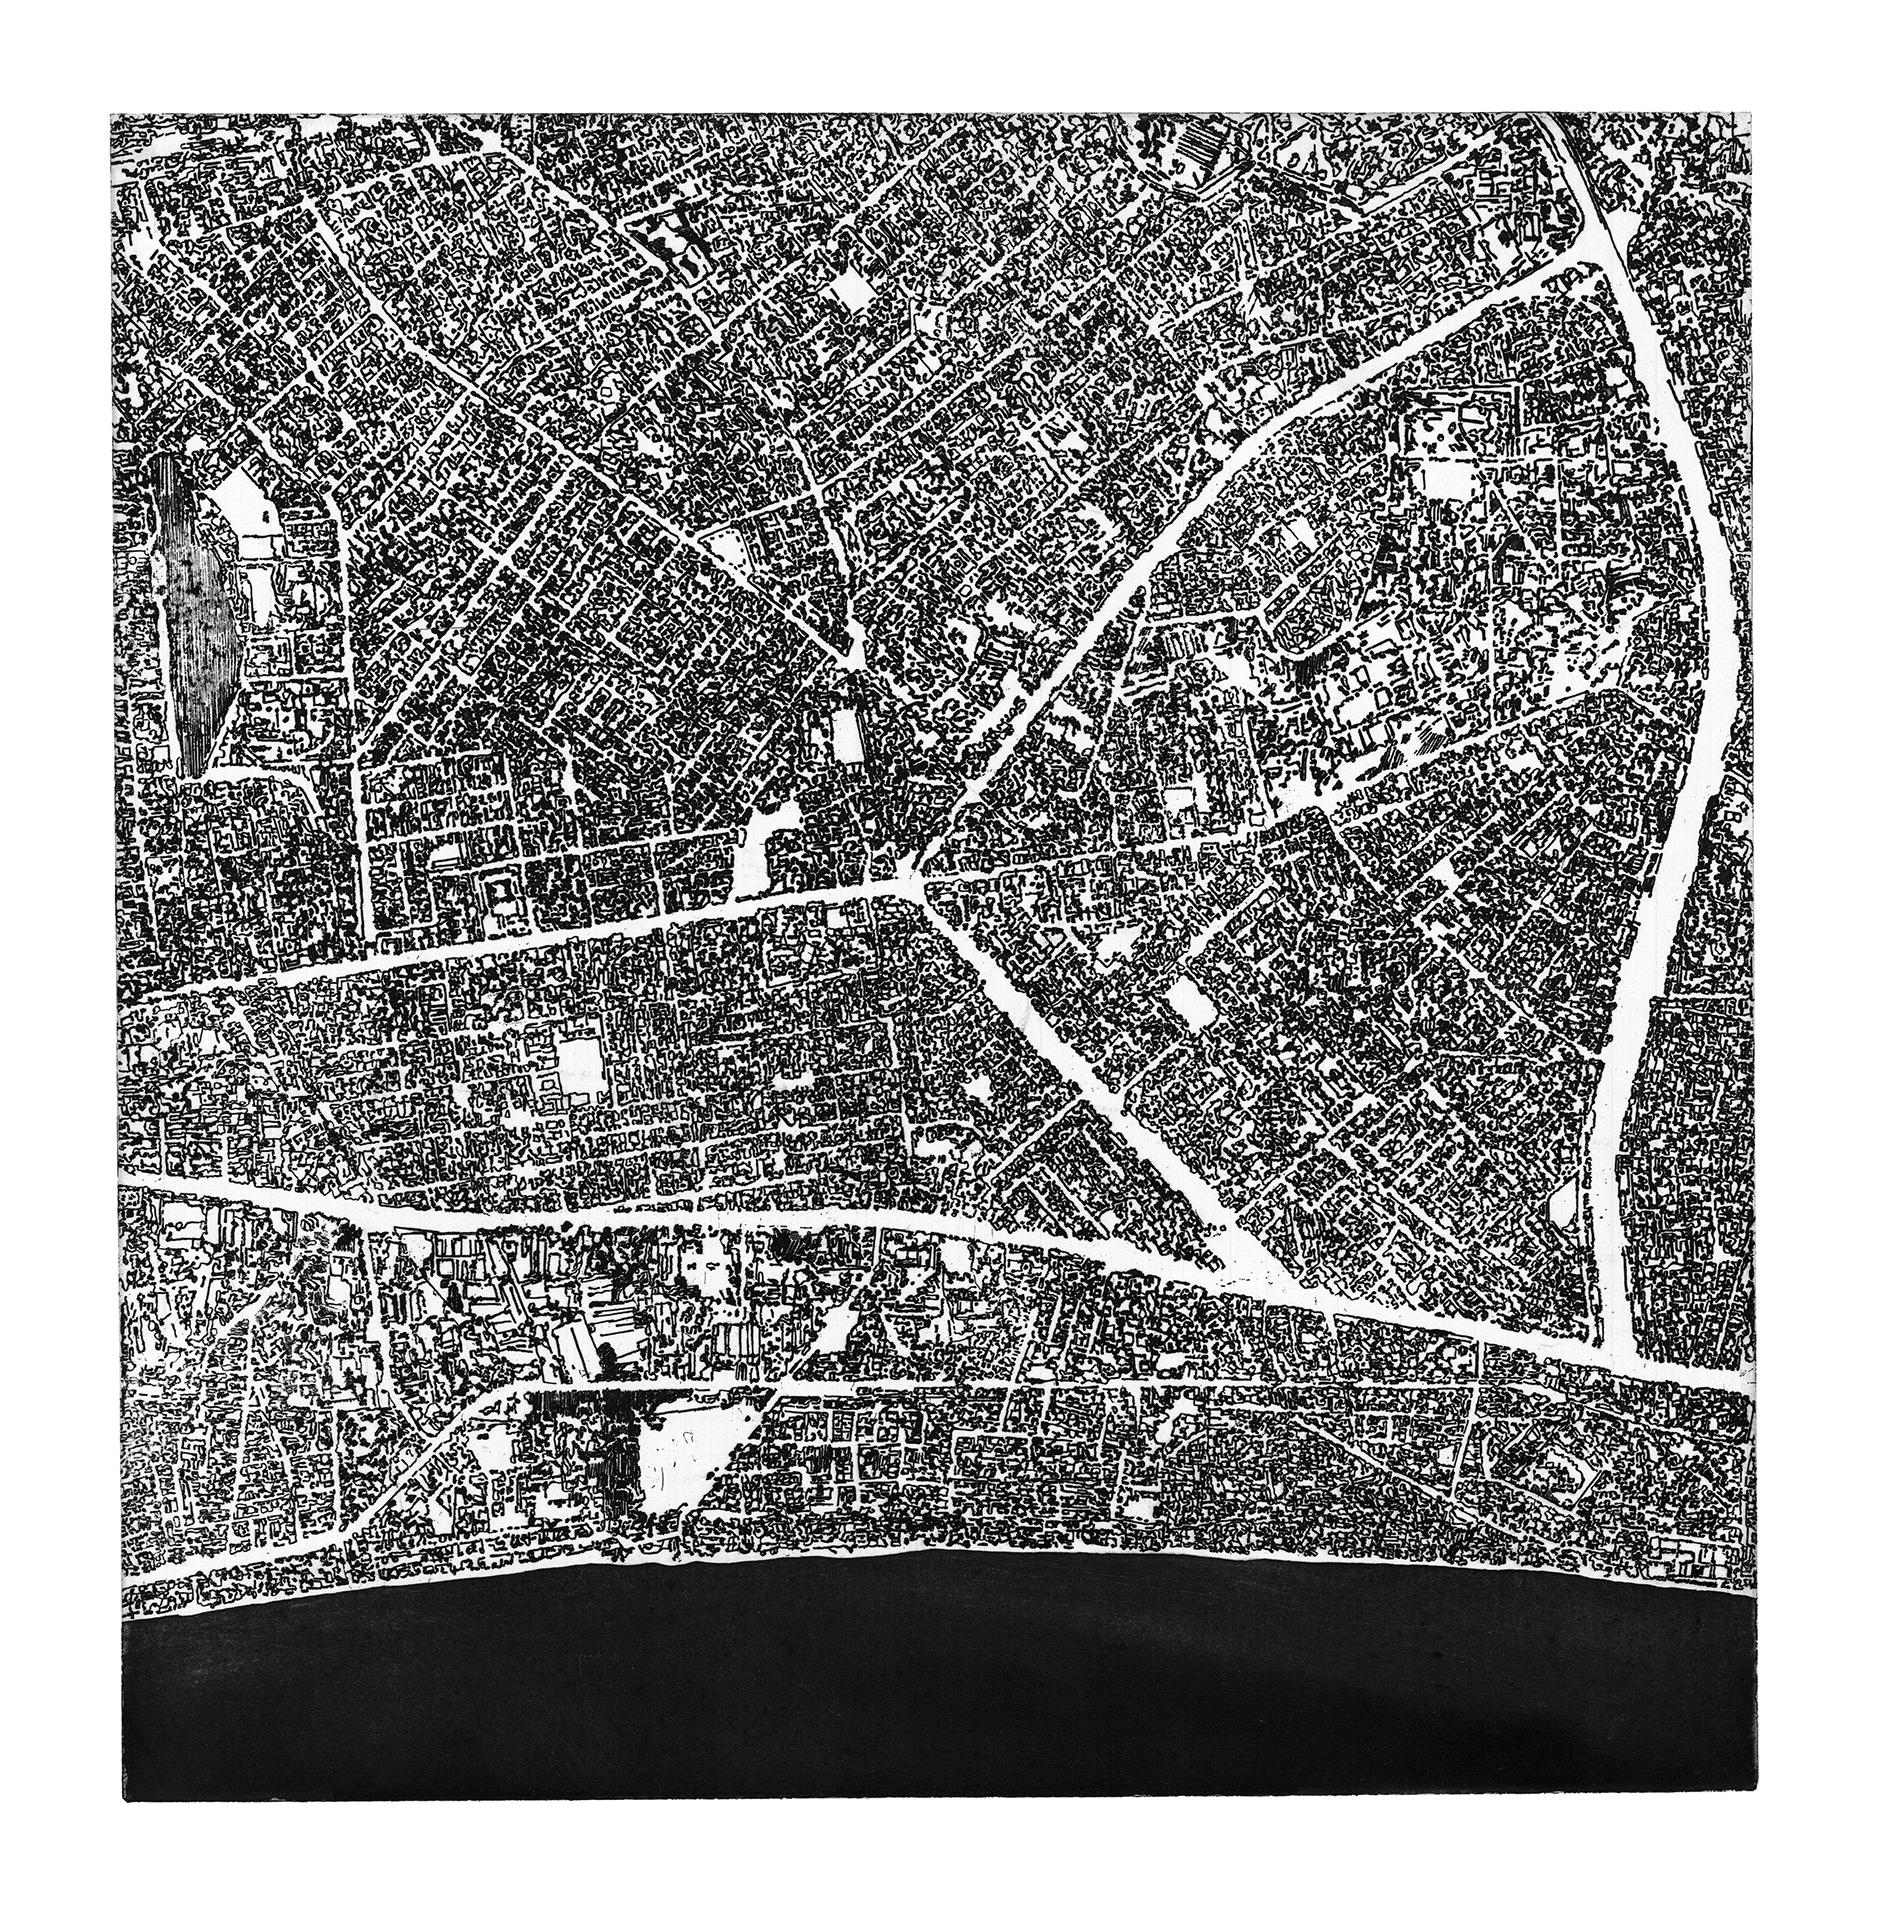 City-1461291154.jpg